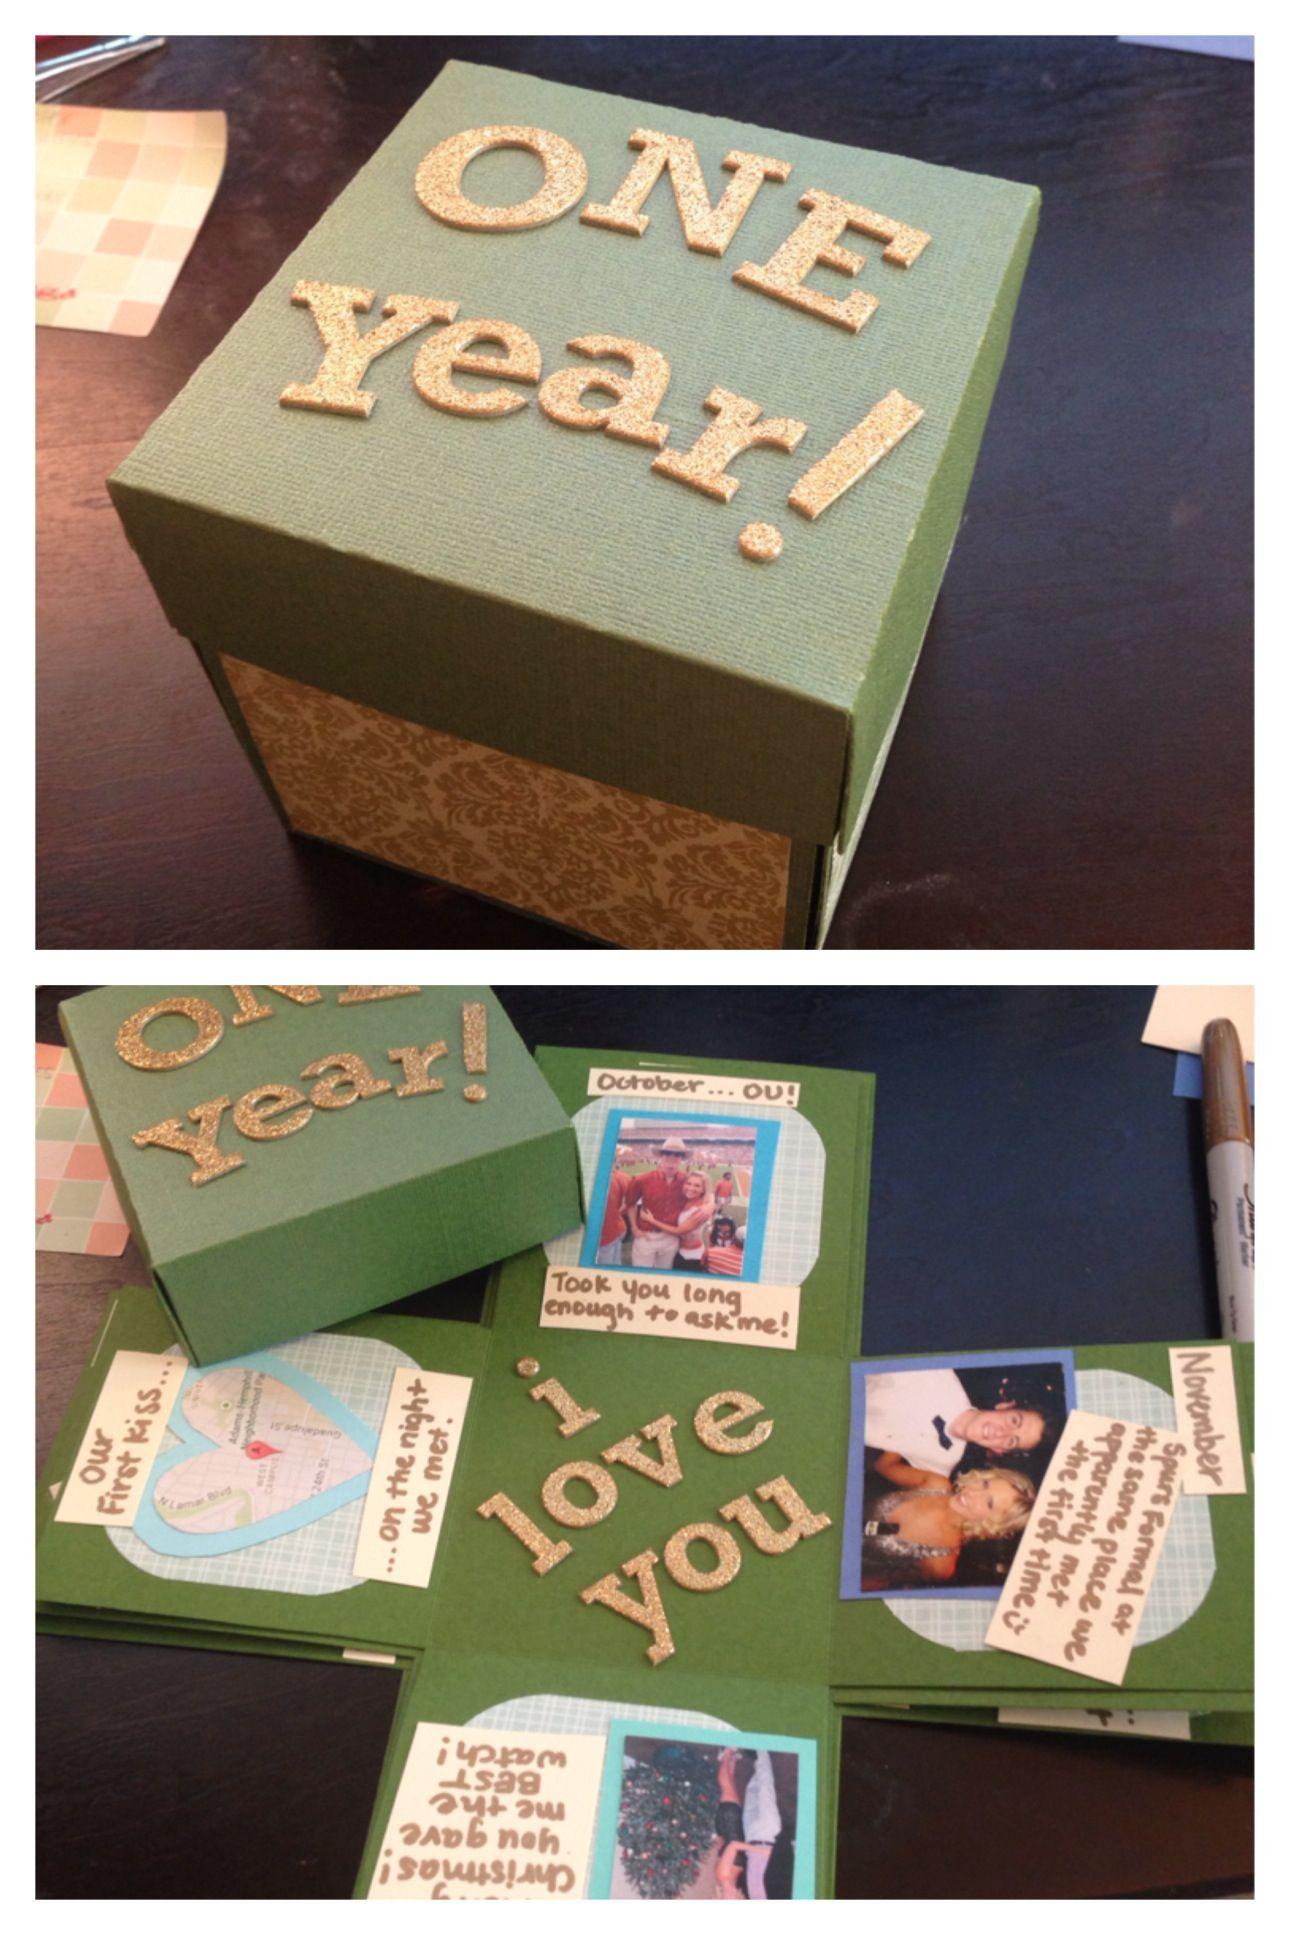 One Year Anniversary Gift Ideas For Boyfriend  Boyfriend Anniversary Gifts on Pinterest